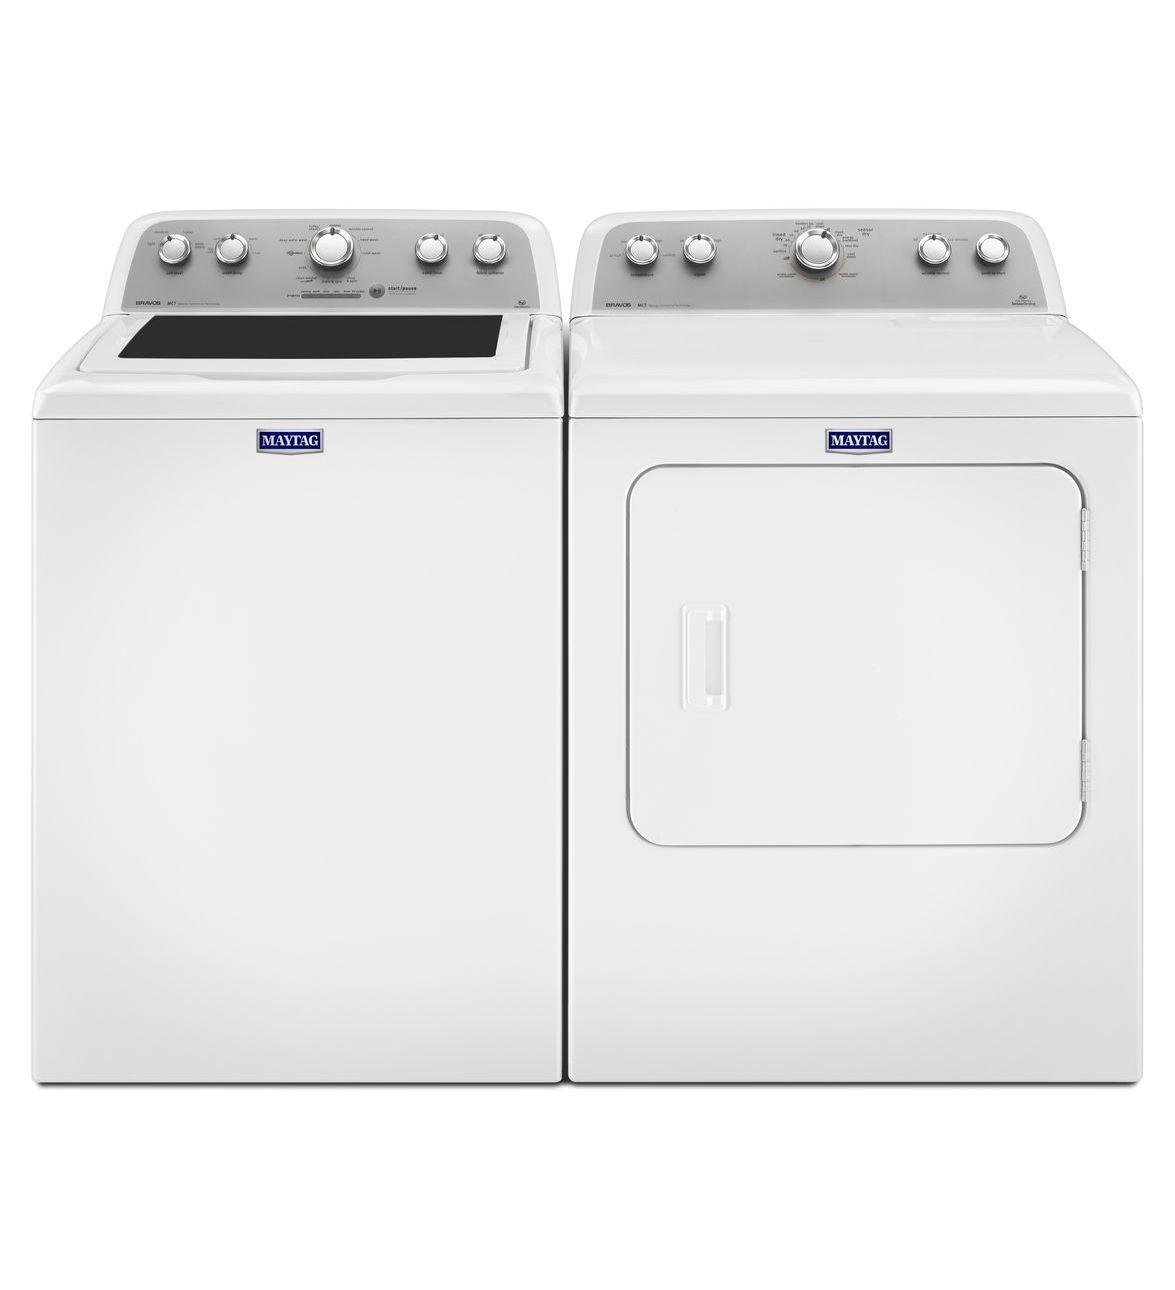 Mvwx655dw Amp Ymedx6stbw From Canadian Appliance Source